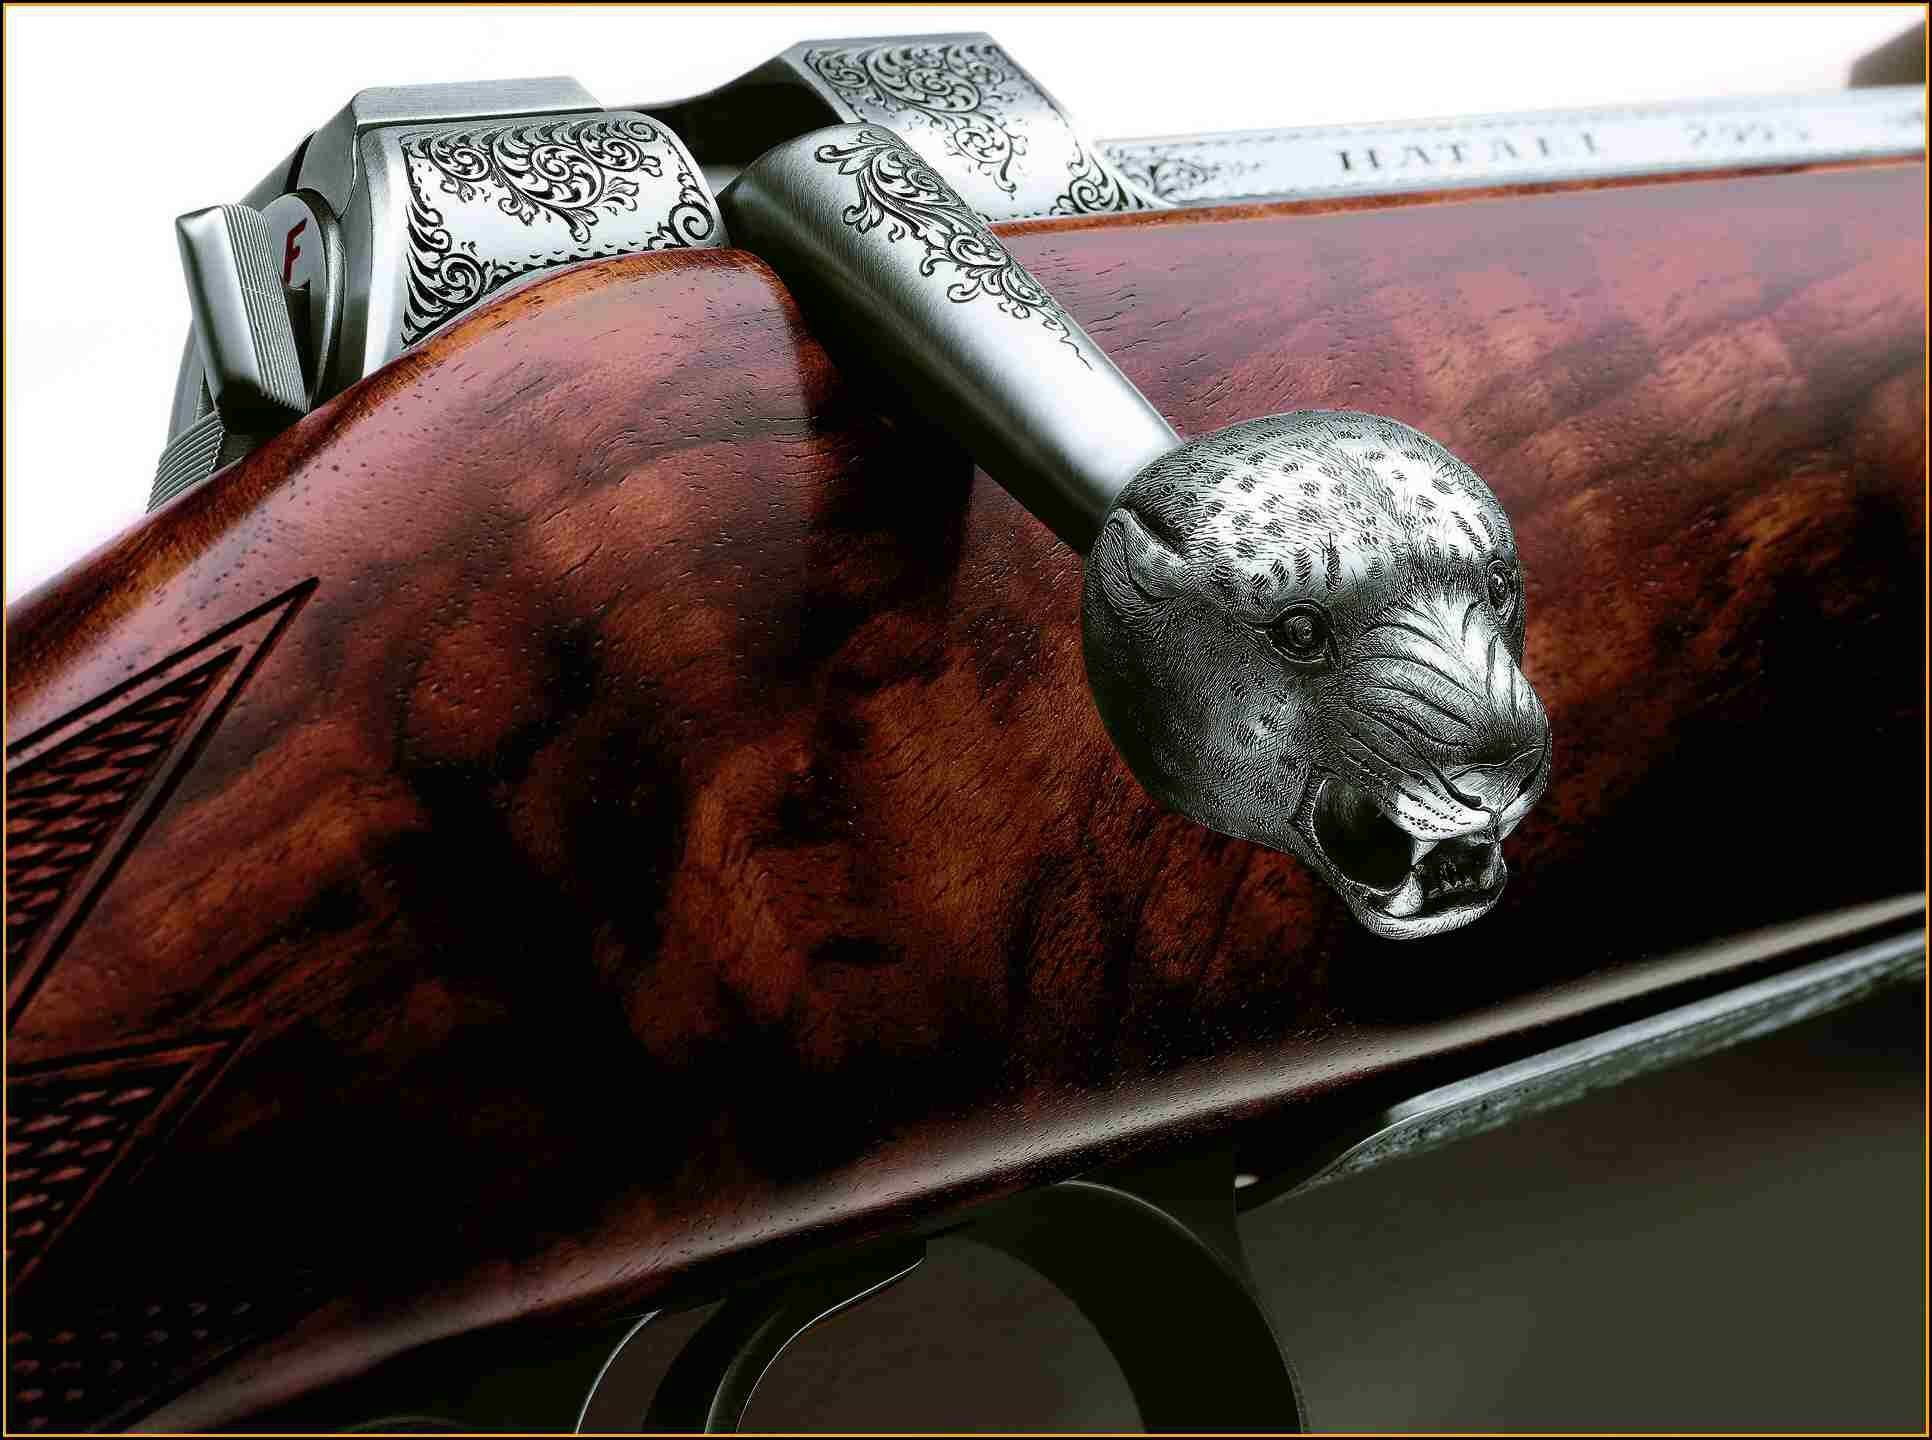 Pin by Edgar Trubins on Rifles Cool guns, Engraving, Artist